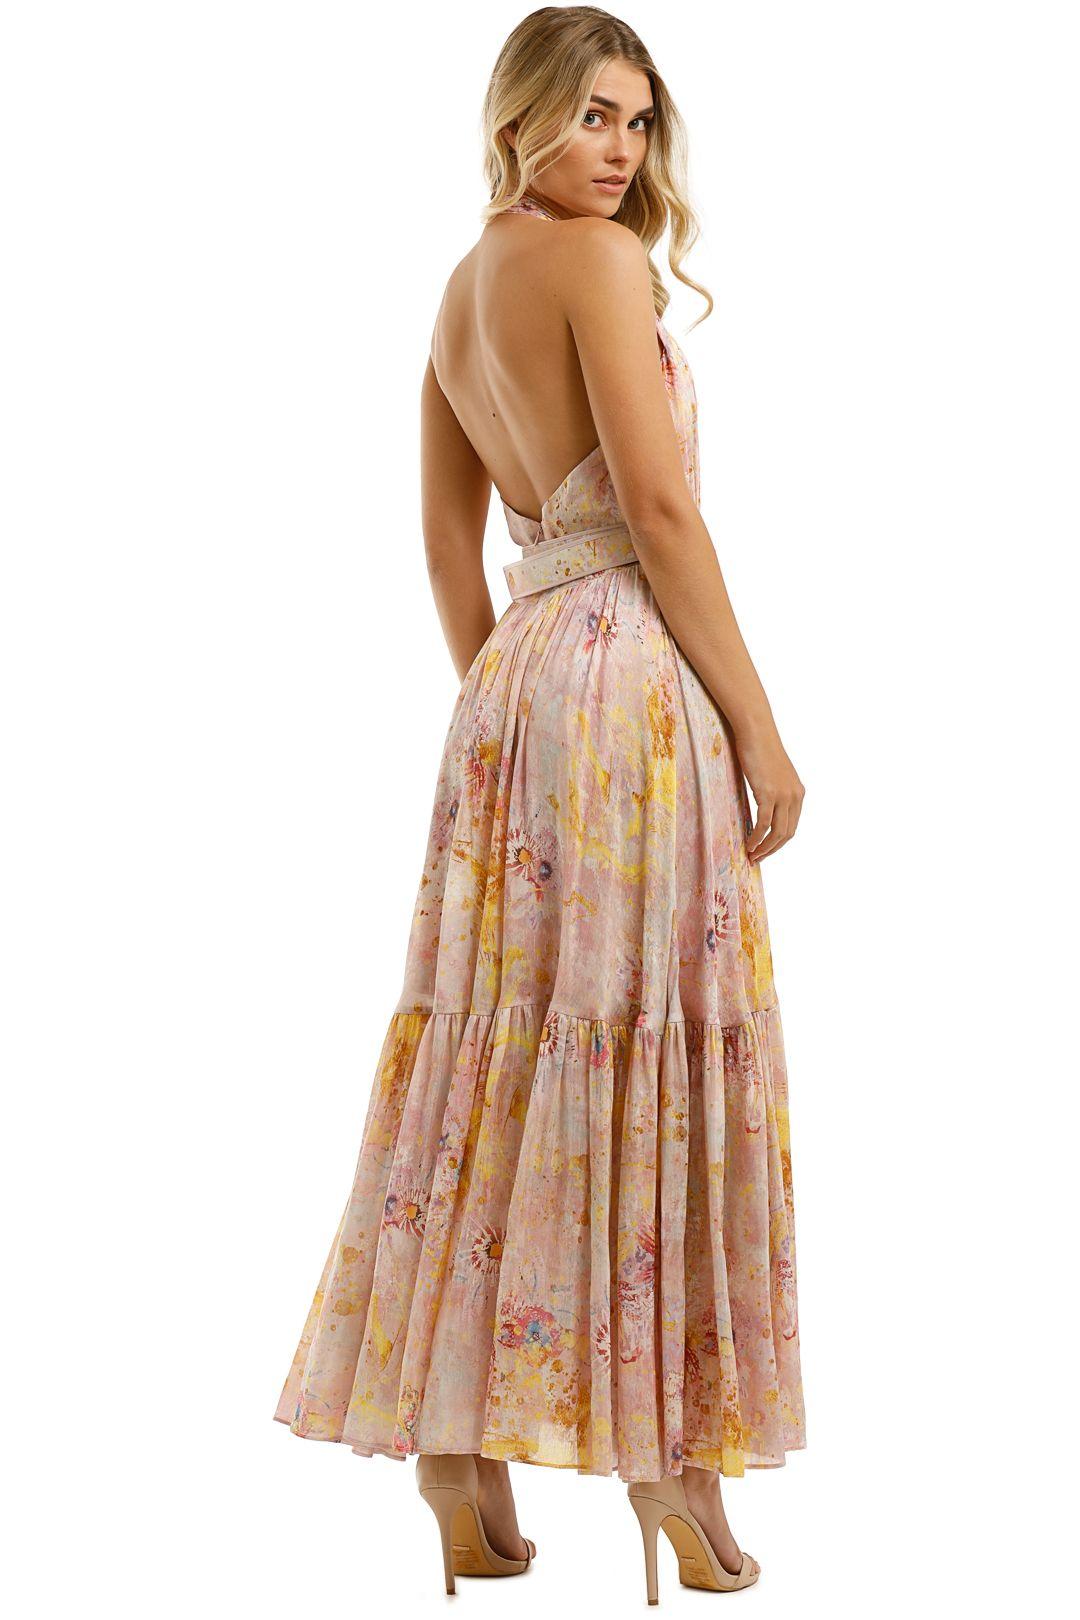 Leo-and-Lin-Adoration-Silk-Linen-Dress-Blush-Back